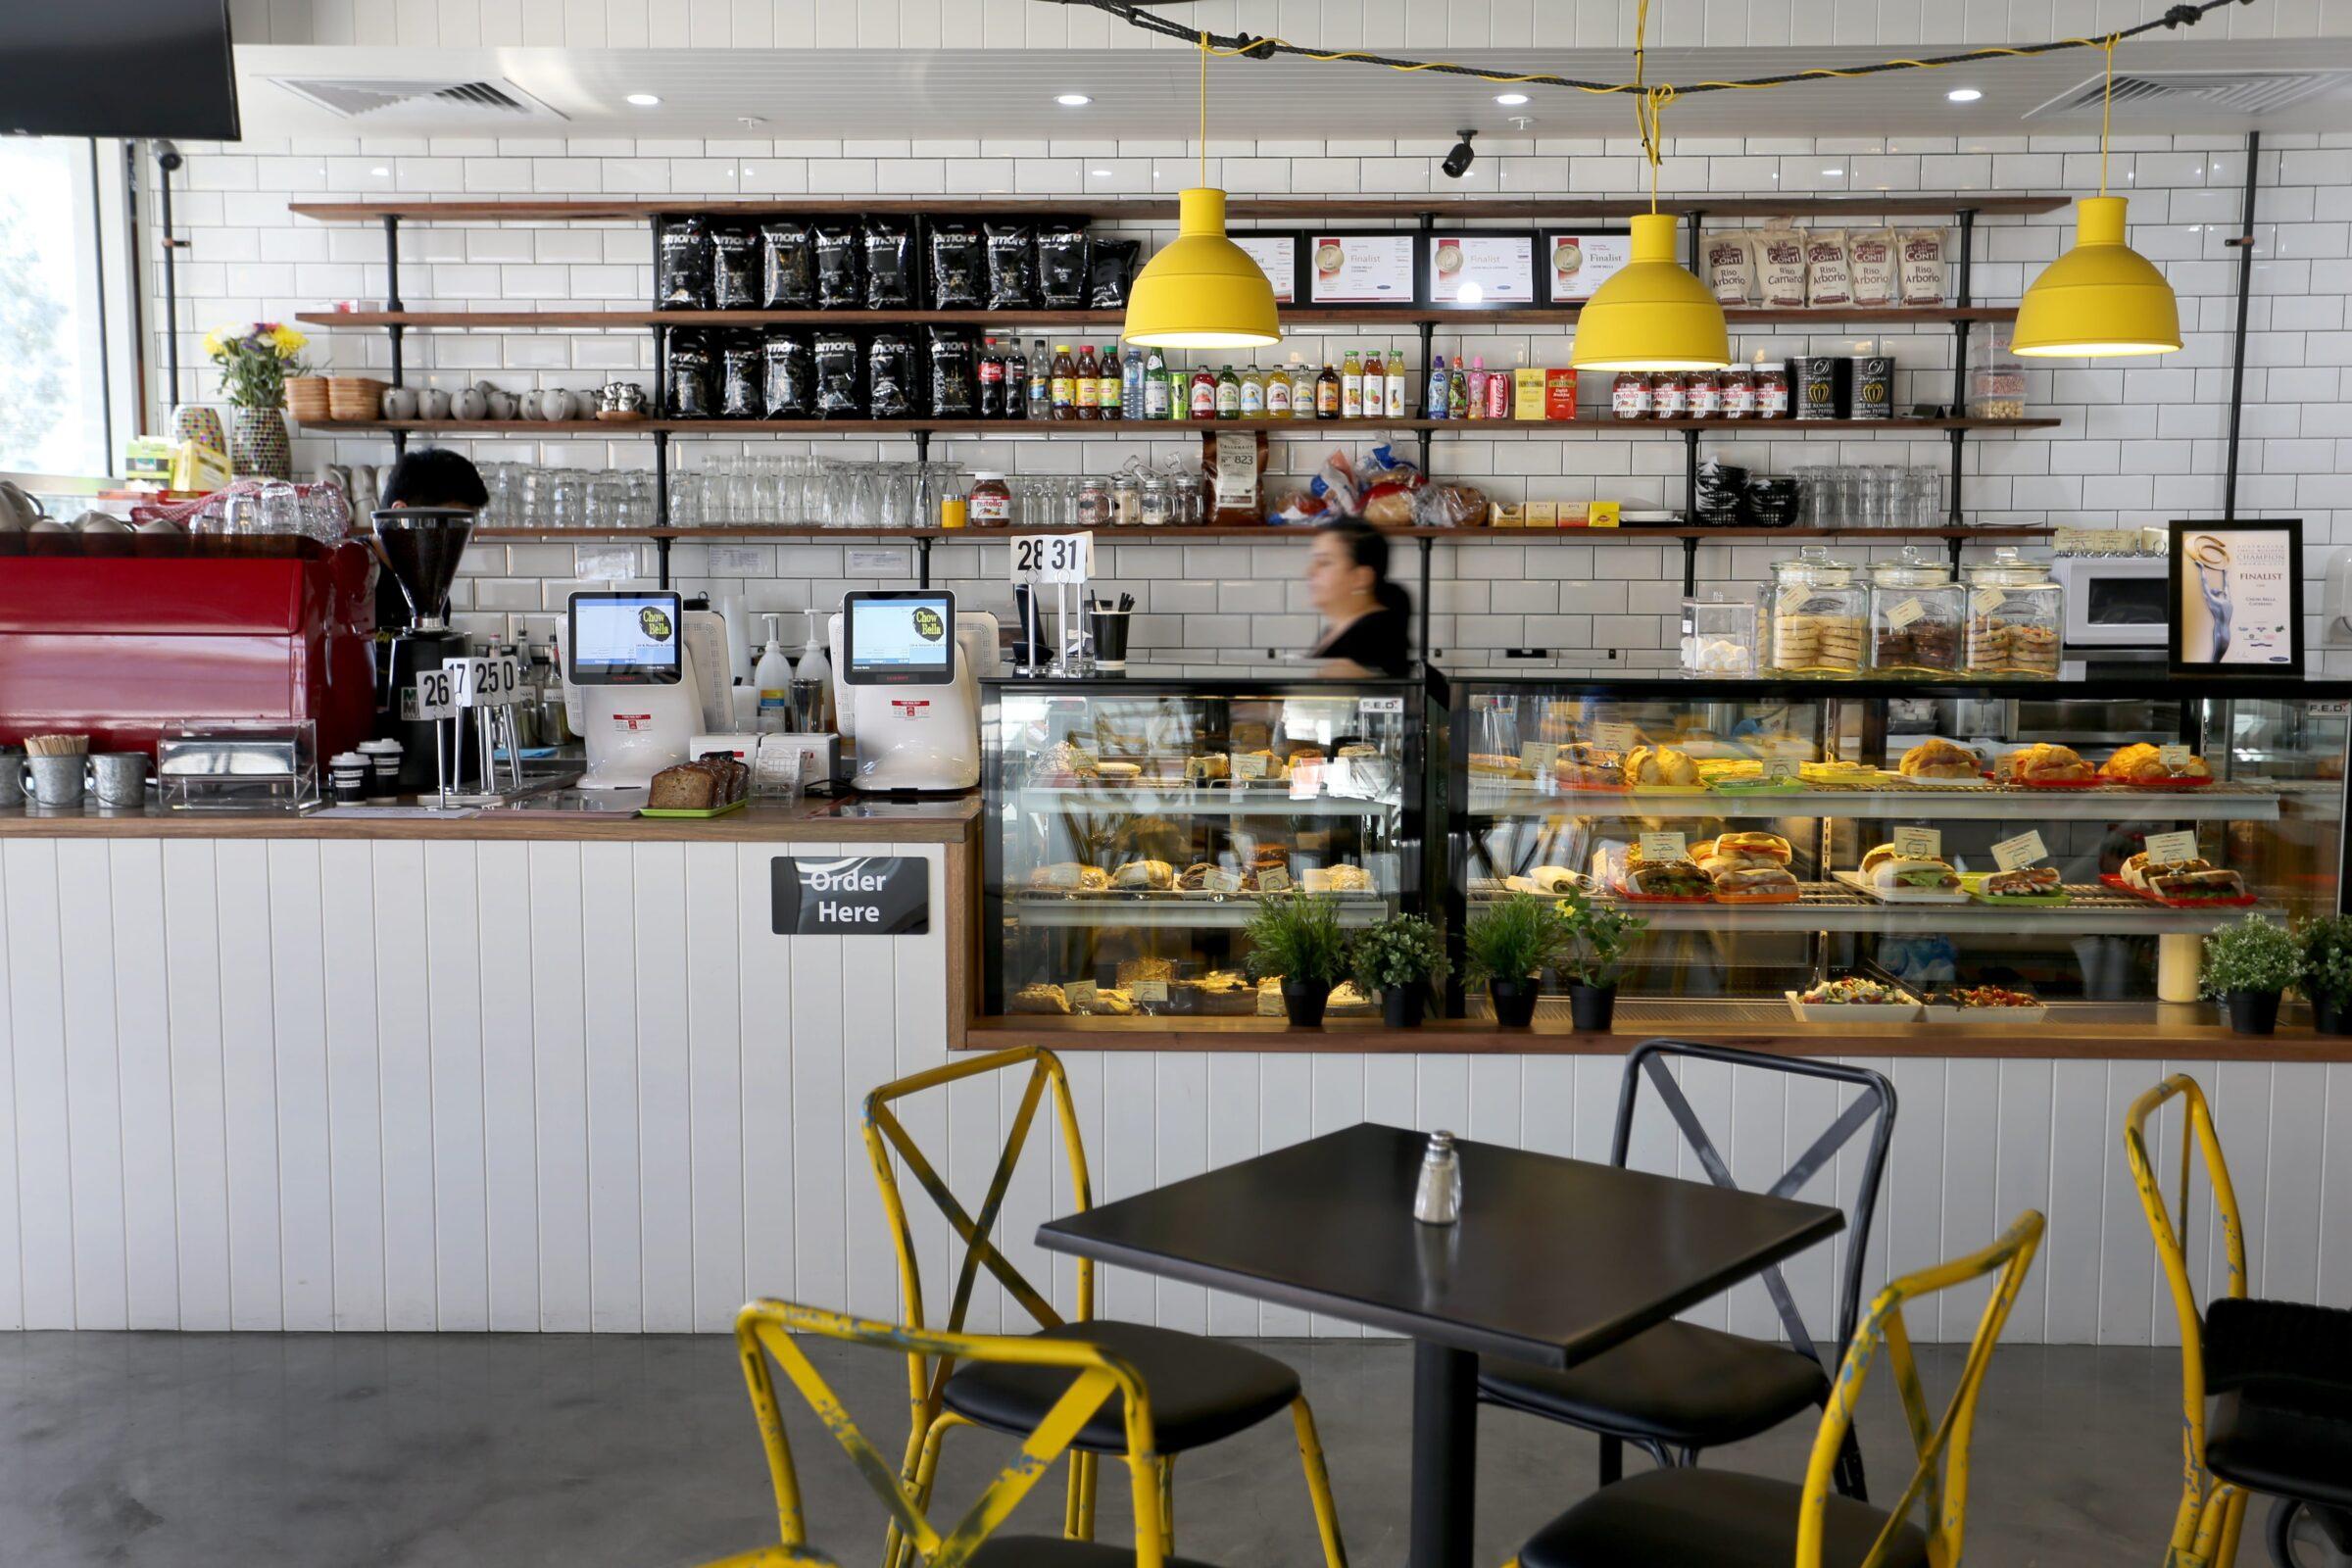 Chow Bella Café